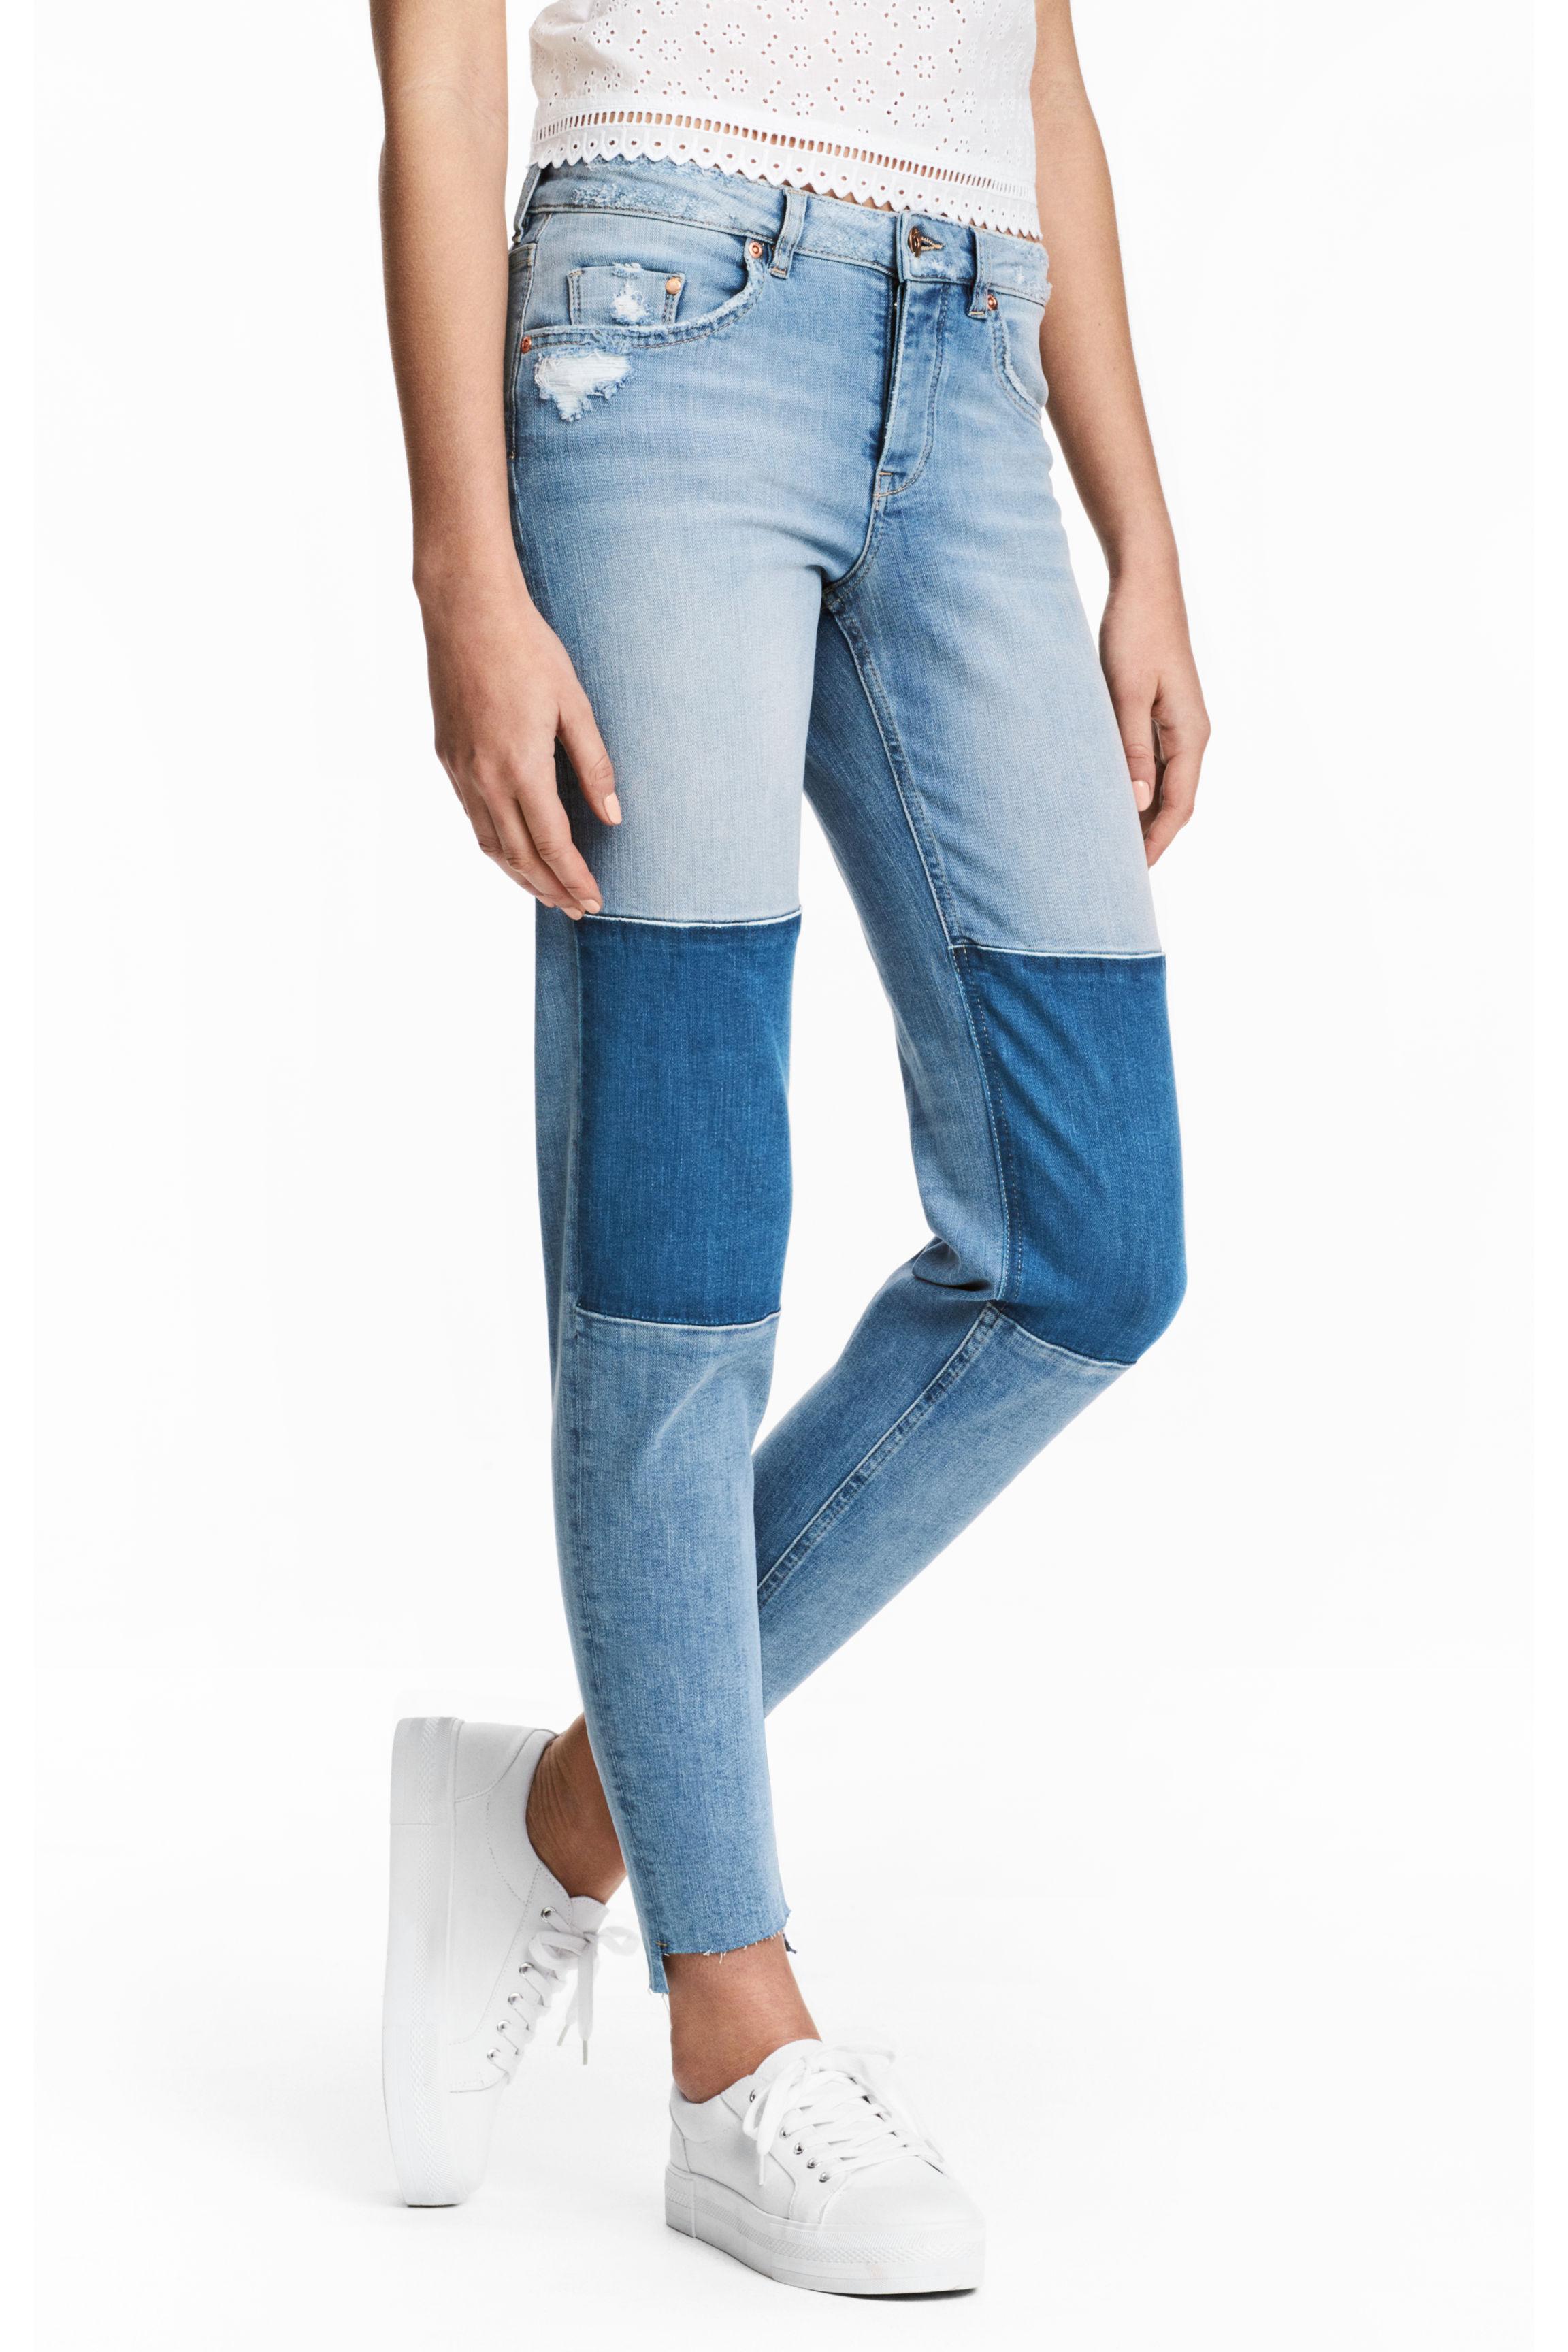 Skinny fazon, <a href='http://www2.hm.com/hu_hu/productpage.0462803007.html#Világos denimkék' target='_blank'>H&M</a></p>